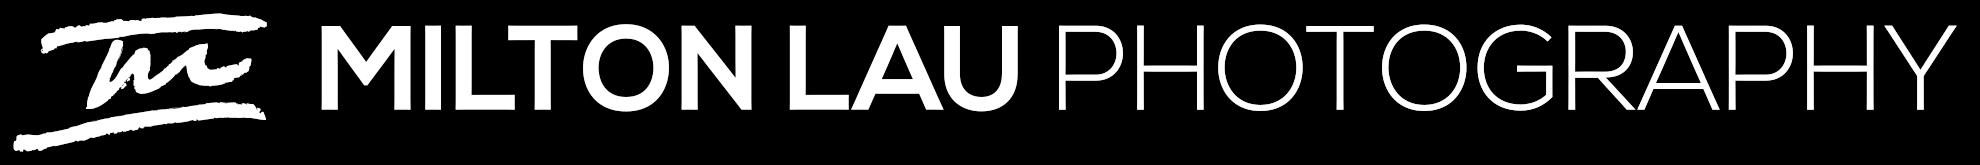 milton lau photography logo